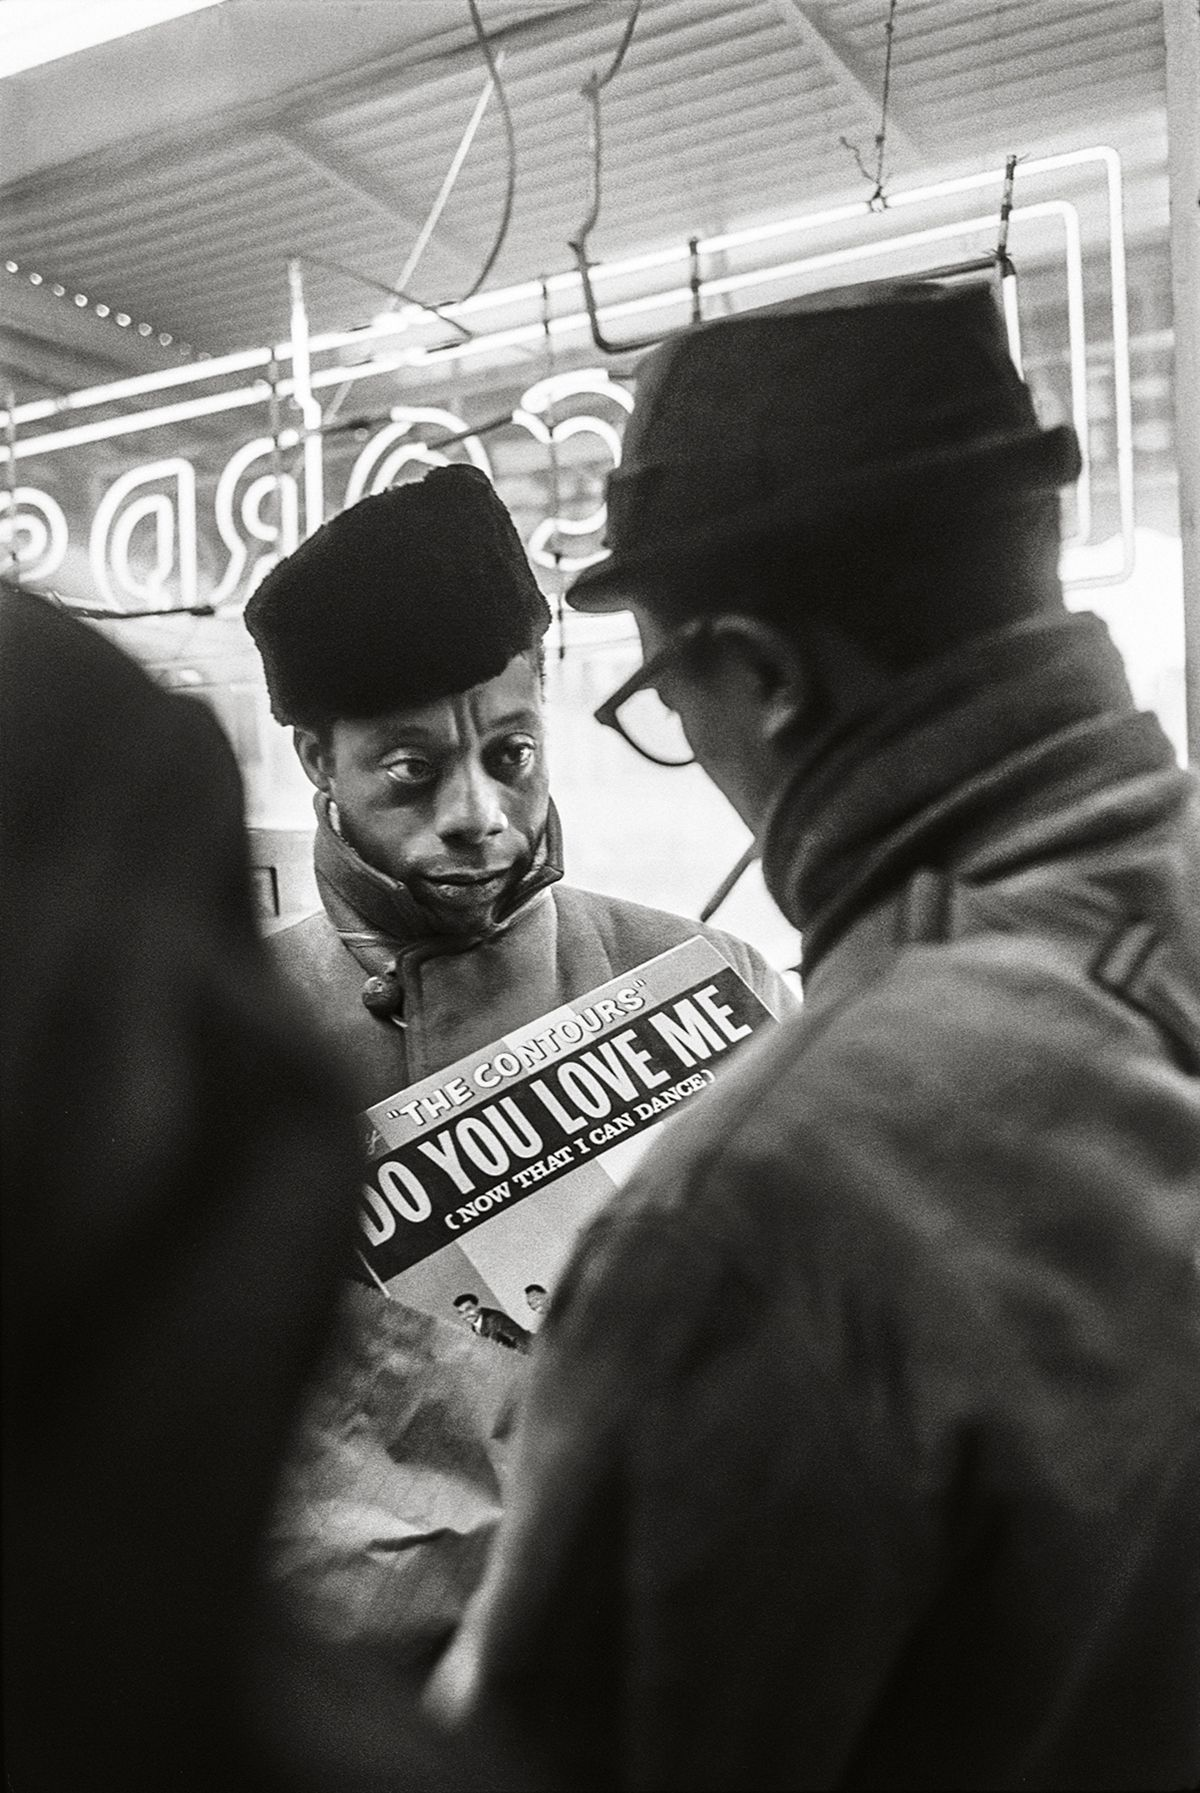 James Baldwin, Do You Love Me, 1963, 20x 16Inches, Silver Gelatin Photograph, Edition of 25